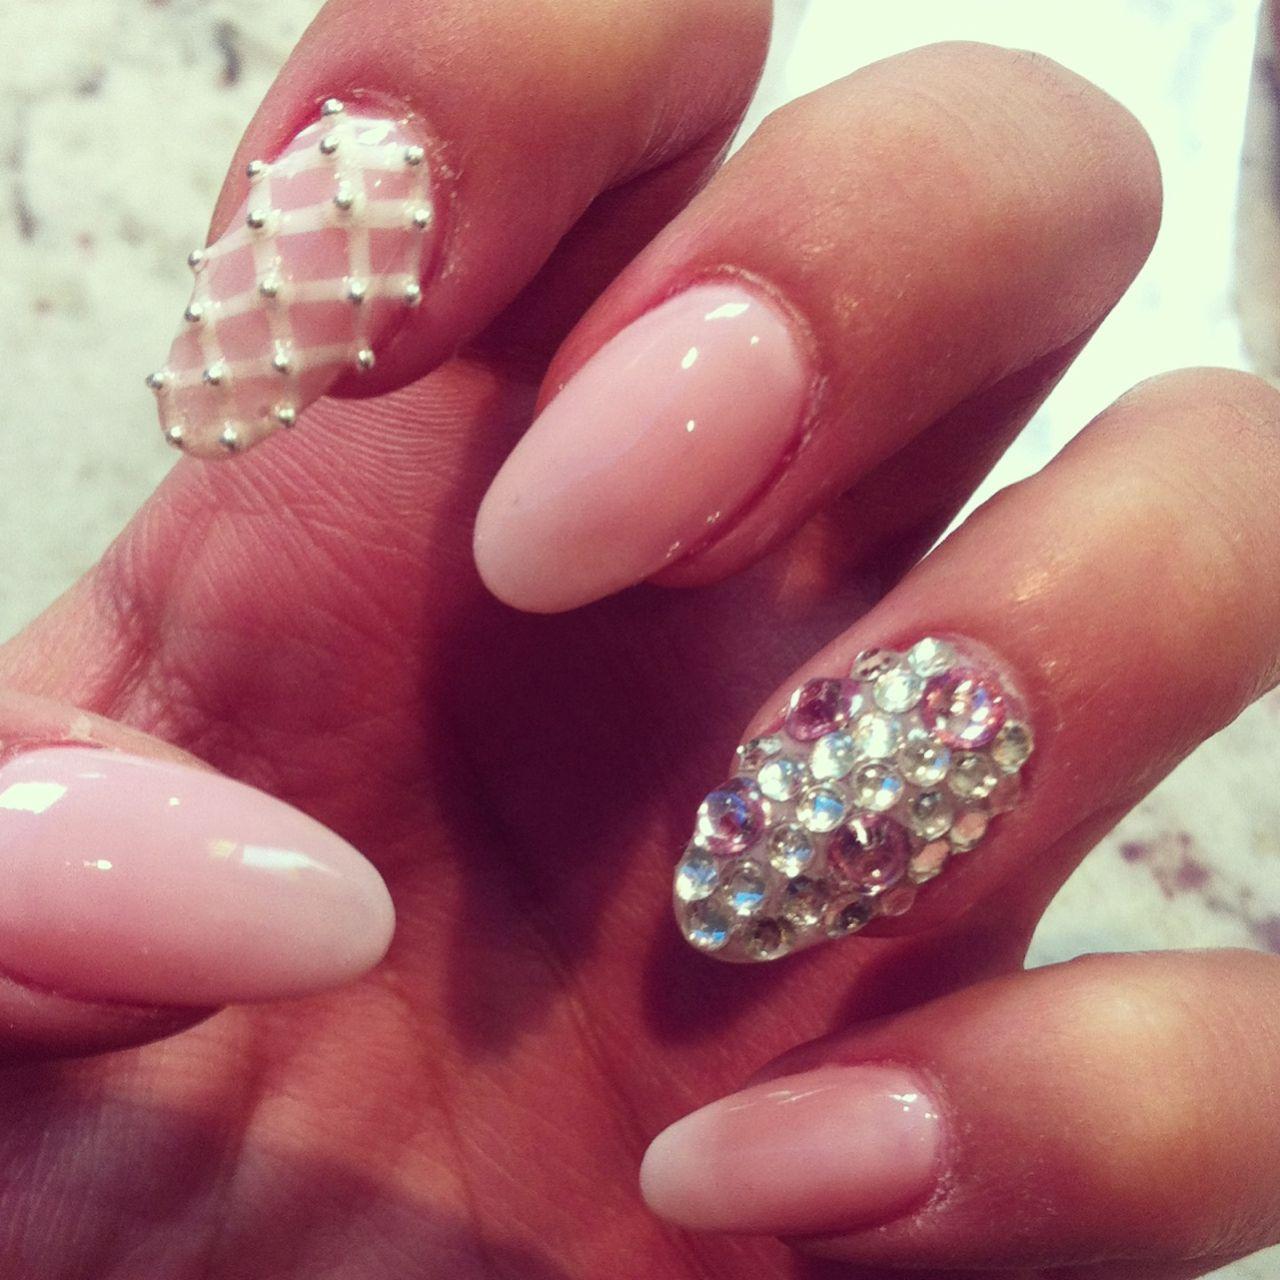 Hate the nail shape but love the design. | Radom | Pinterest ...